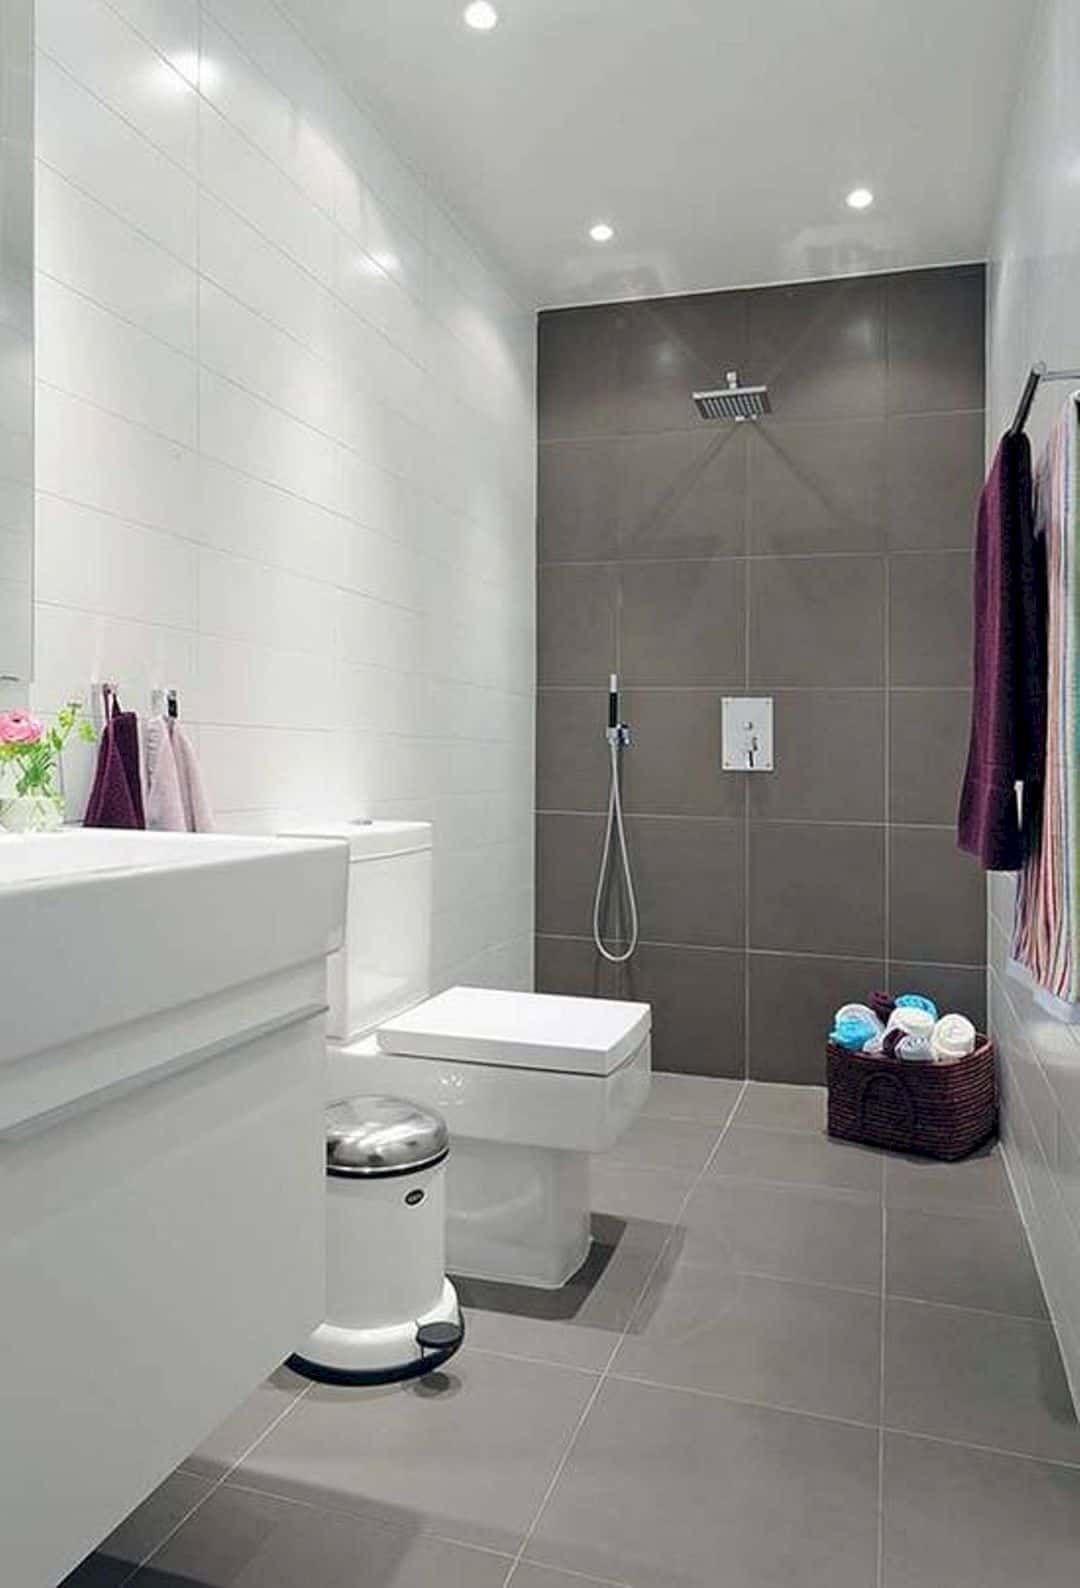 5 Modern Small Bathroom Trends for 2020 | Small bathroom ...